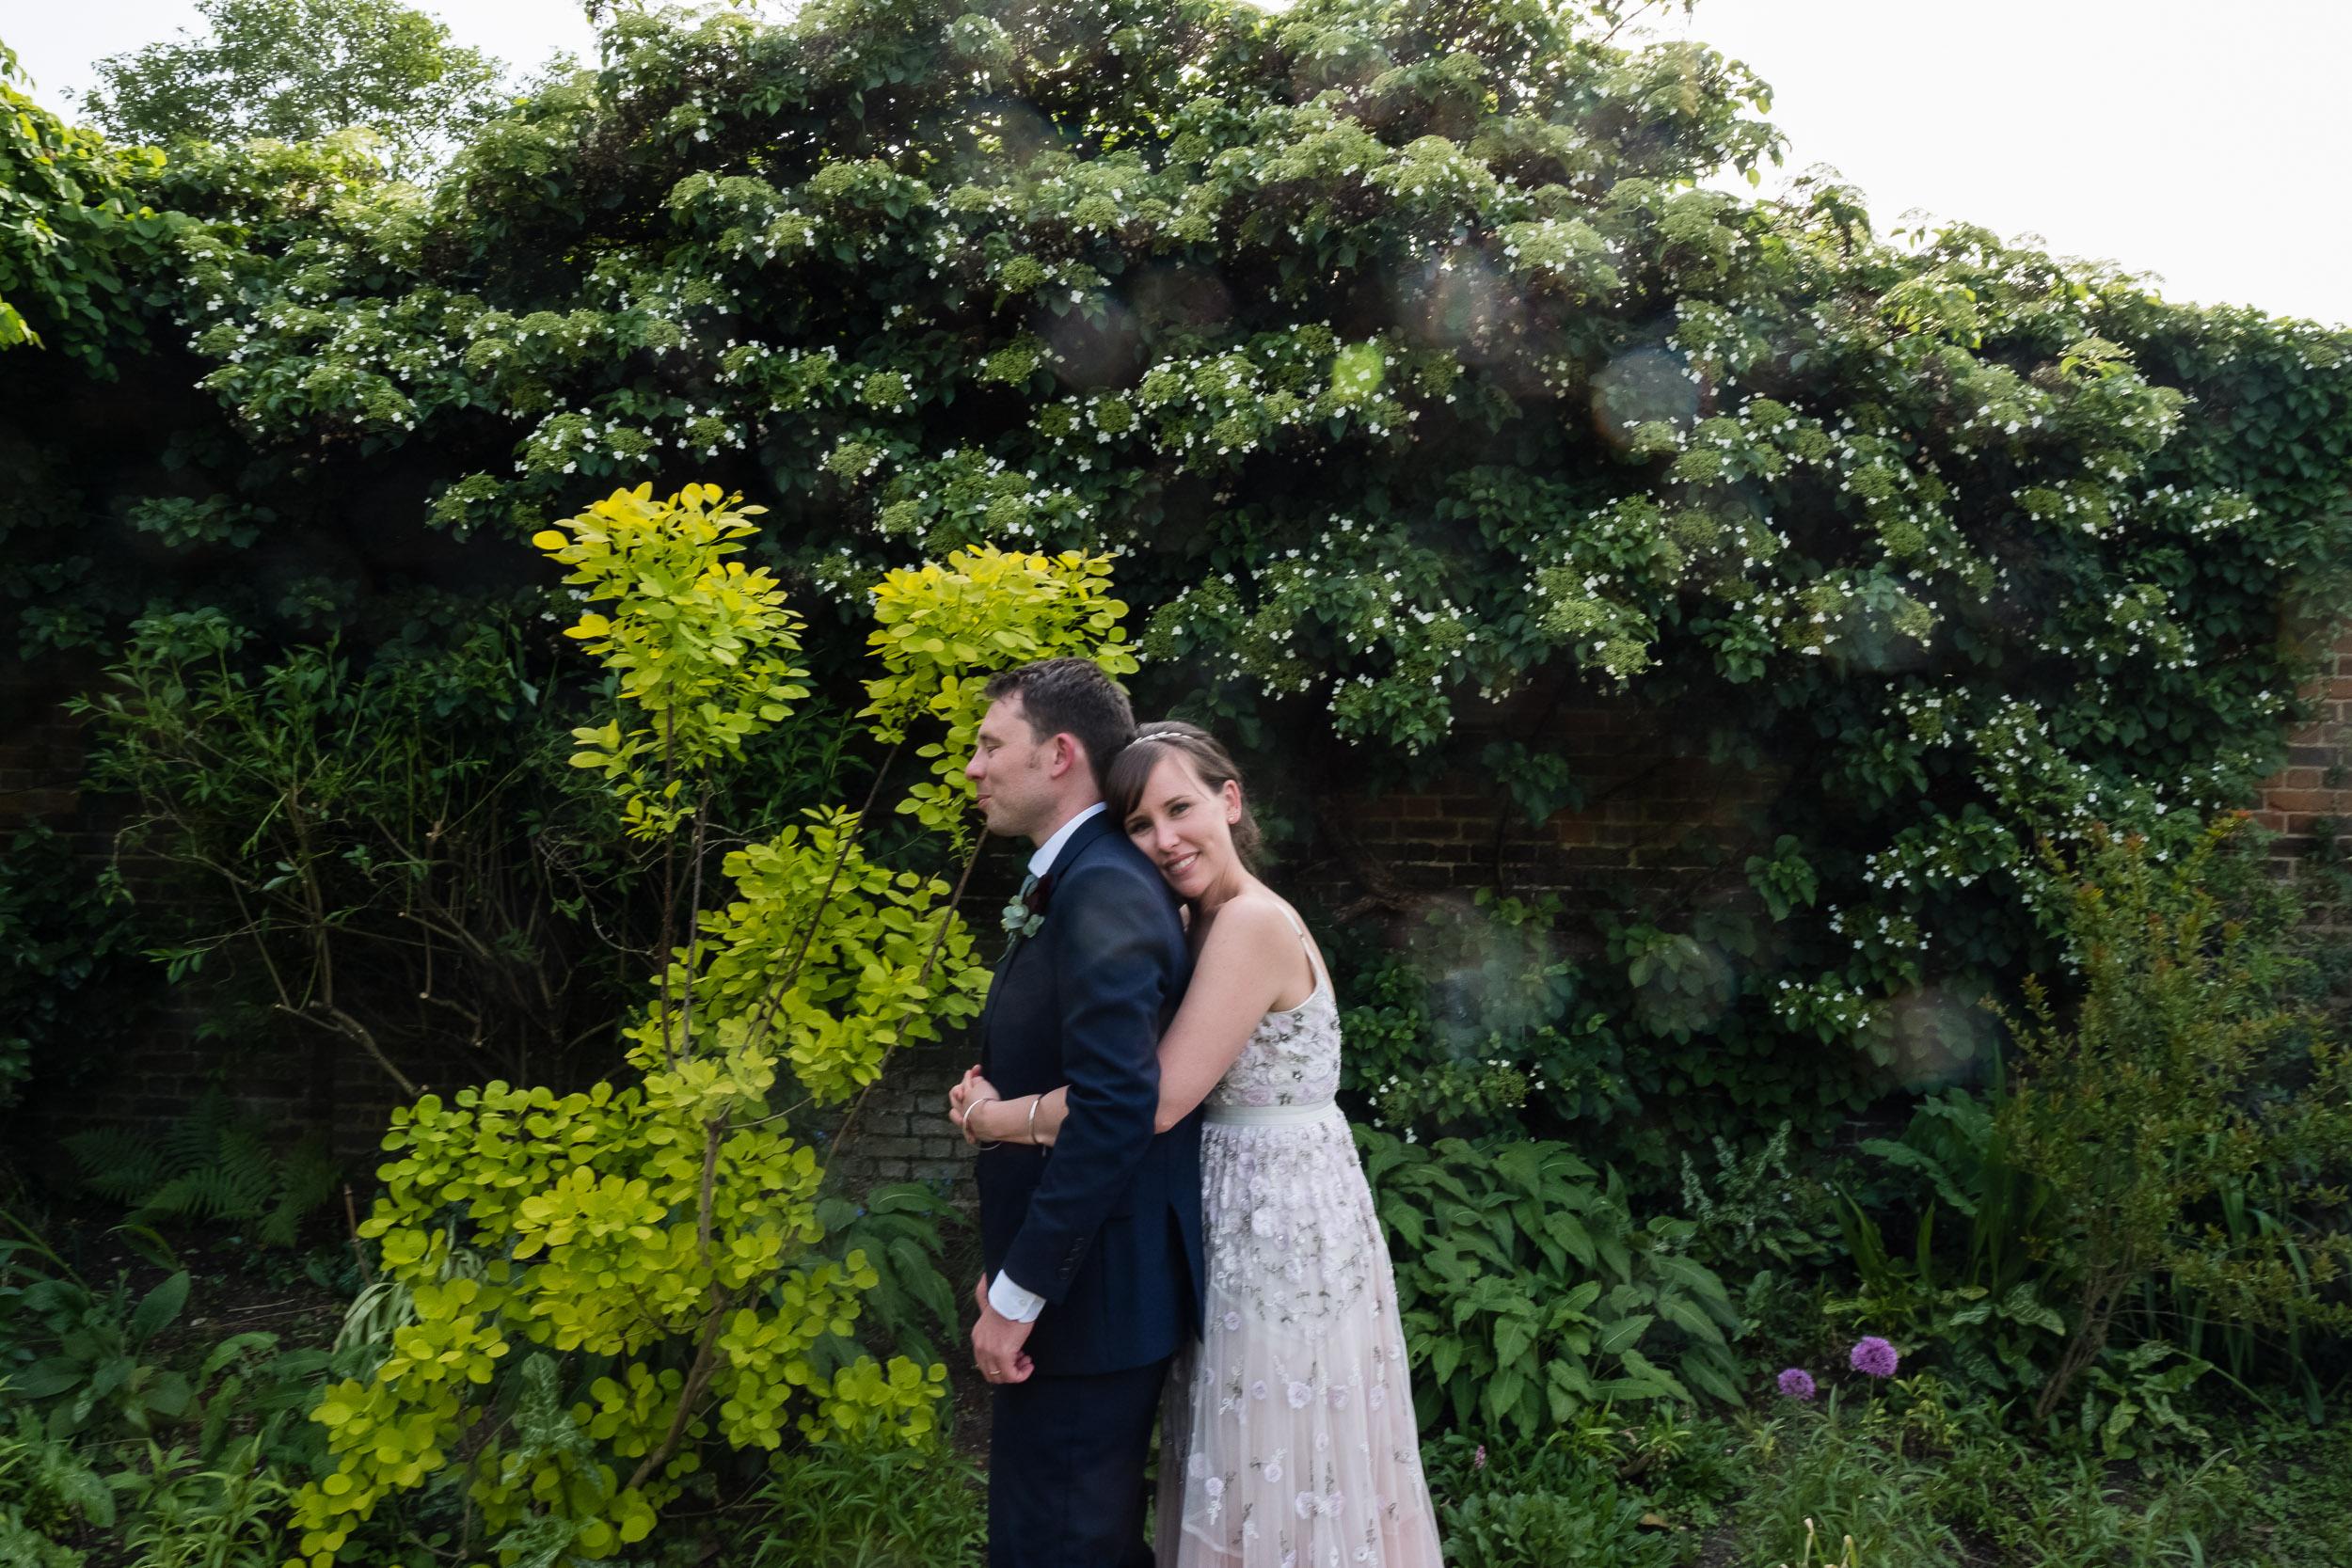 brockwell-lido-brixton-herne-hill-wedding-284.jpg